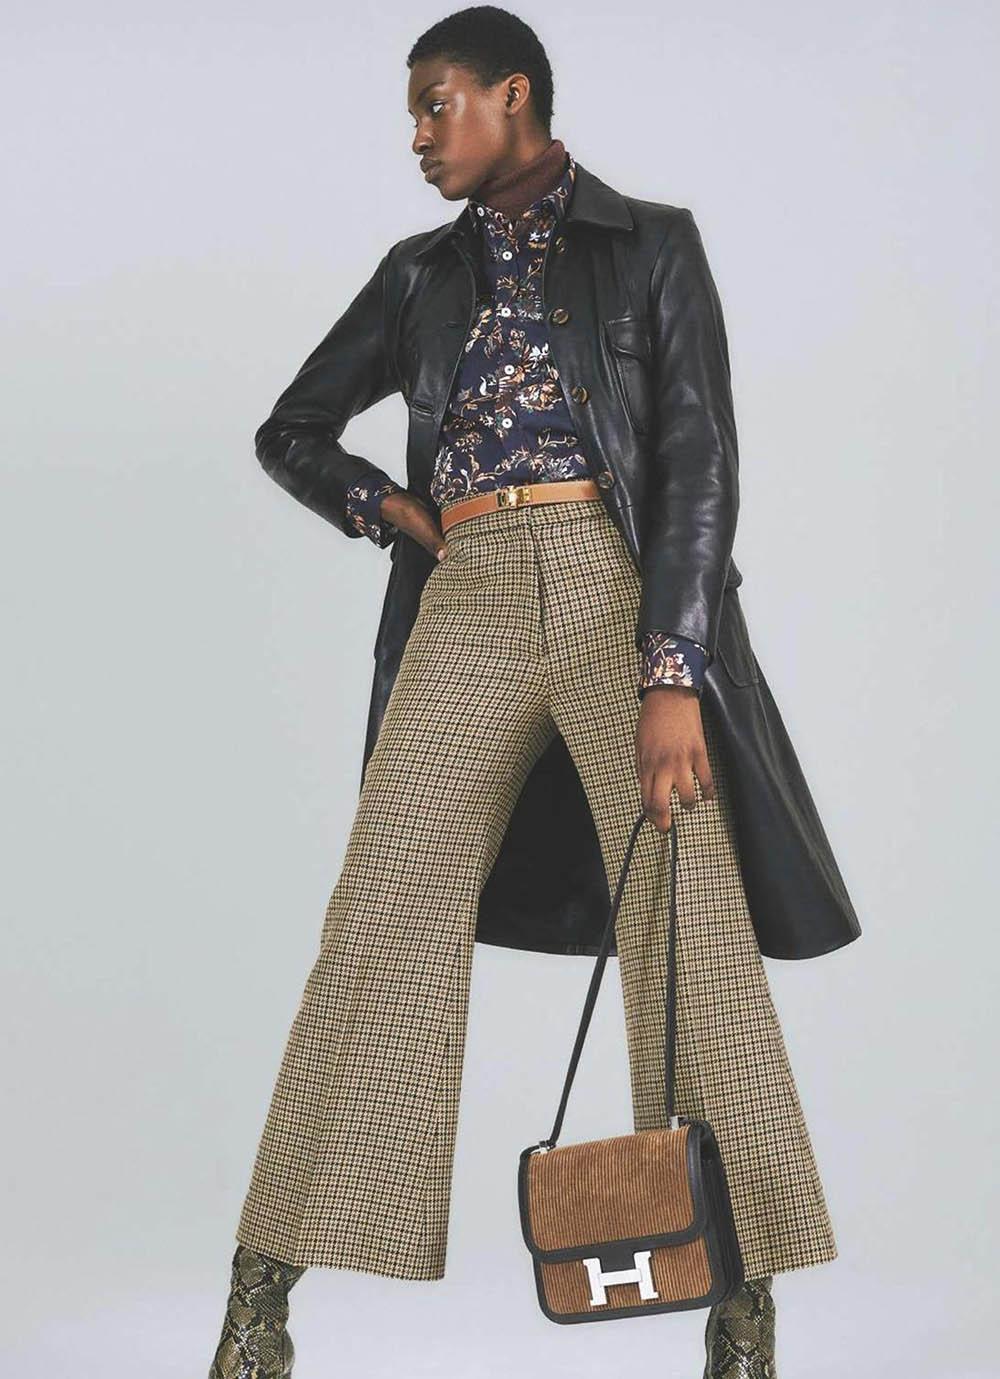 Exaucée De Dieu Makuiza by Stephanie Pfaender for Elle France October 2nd, 2020